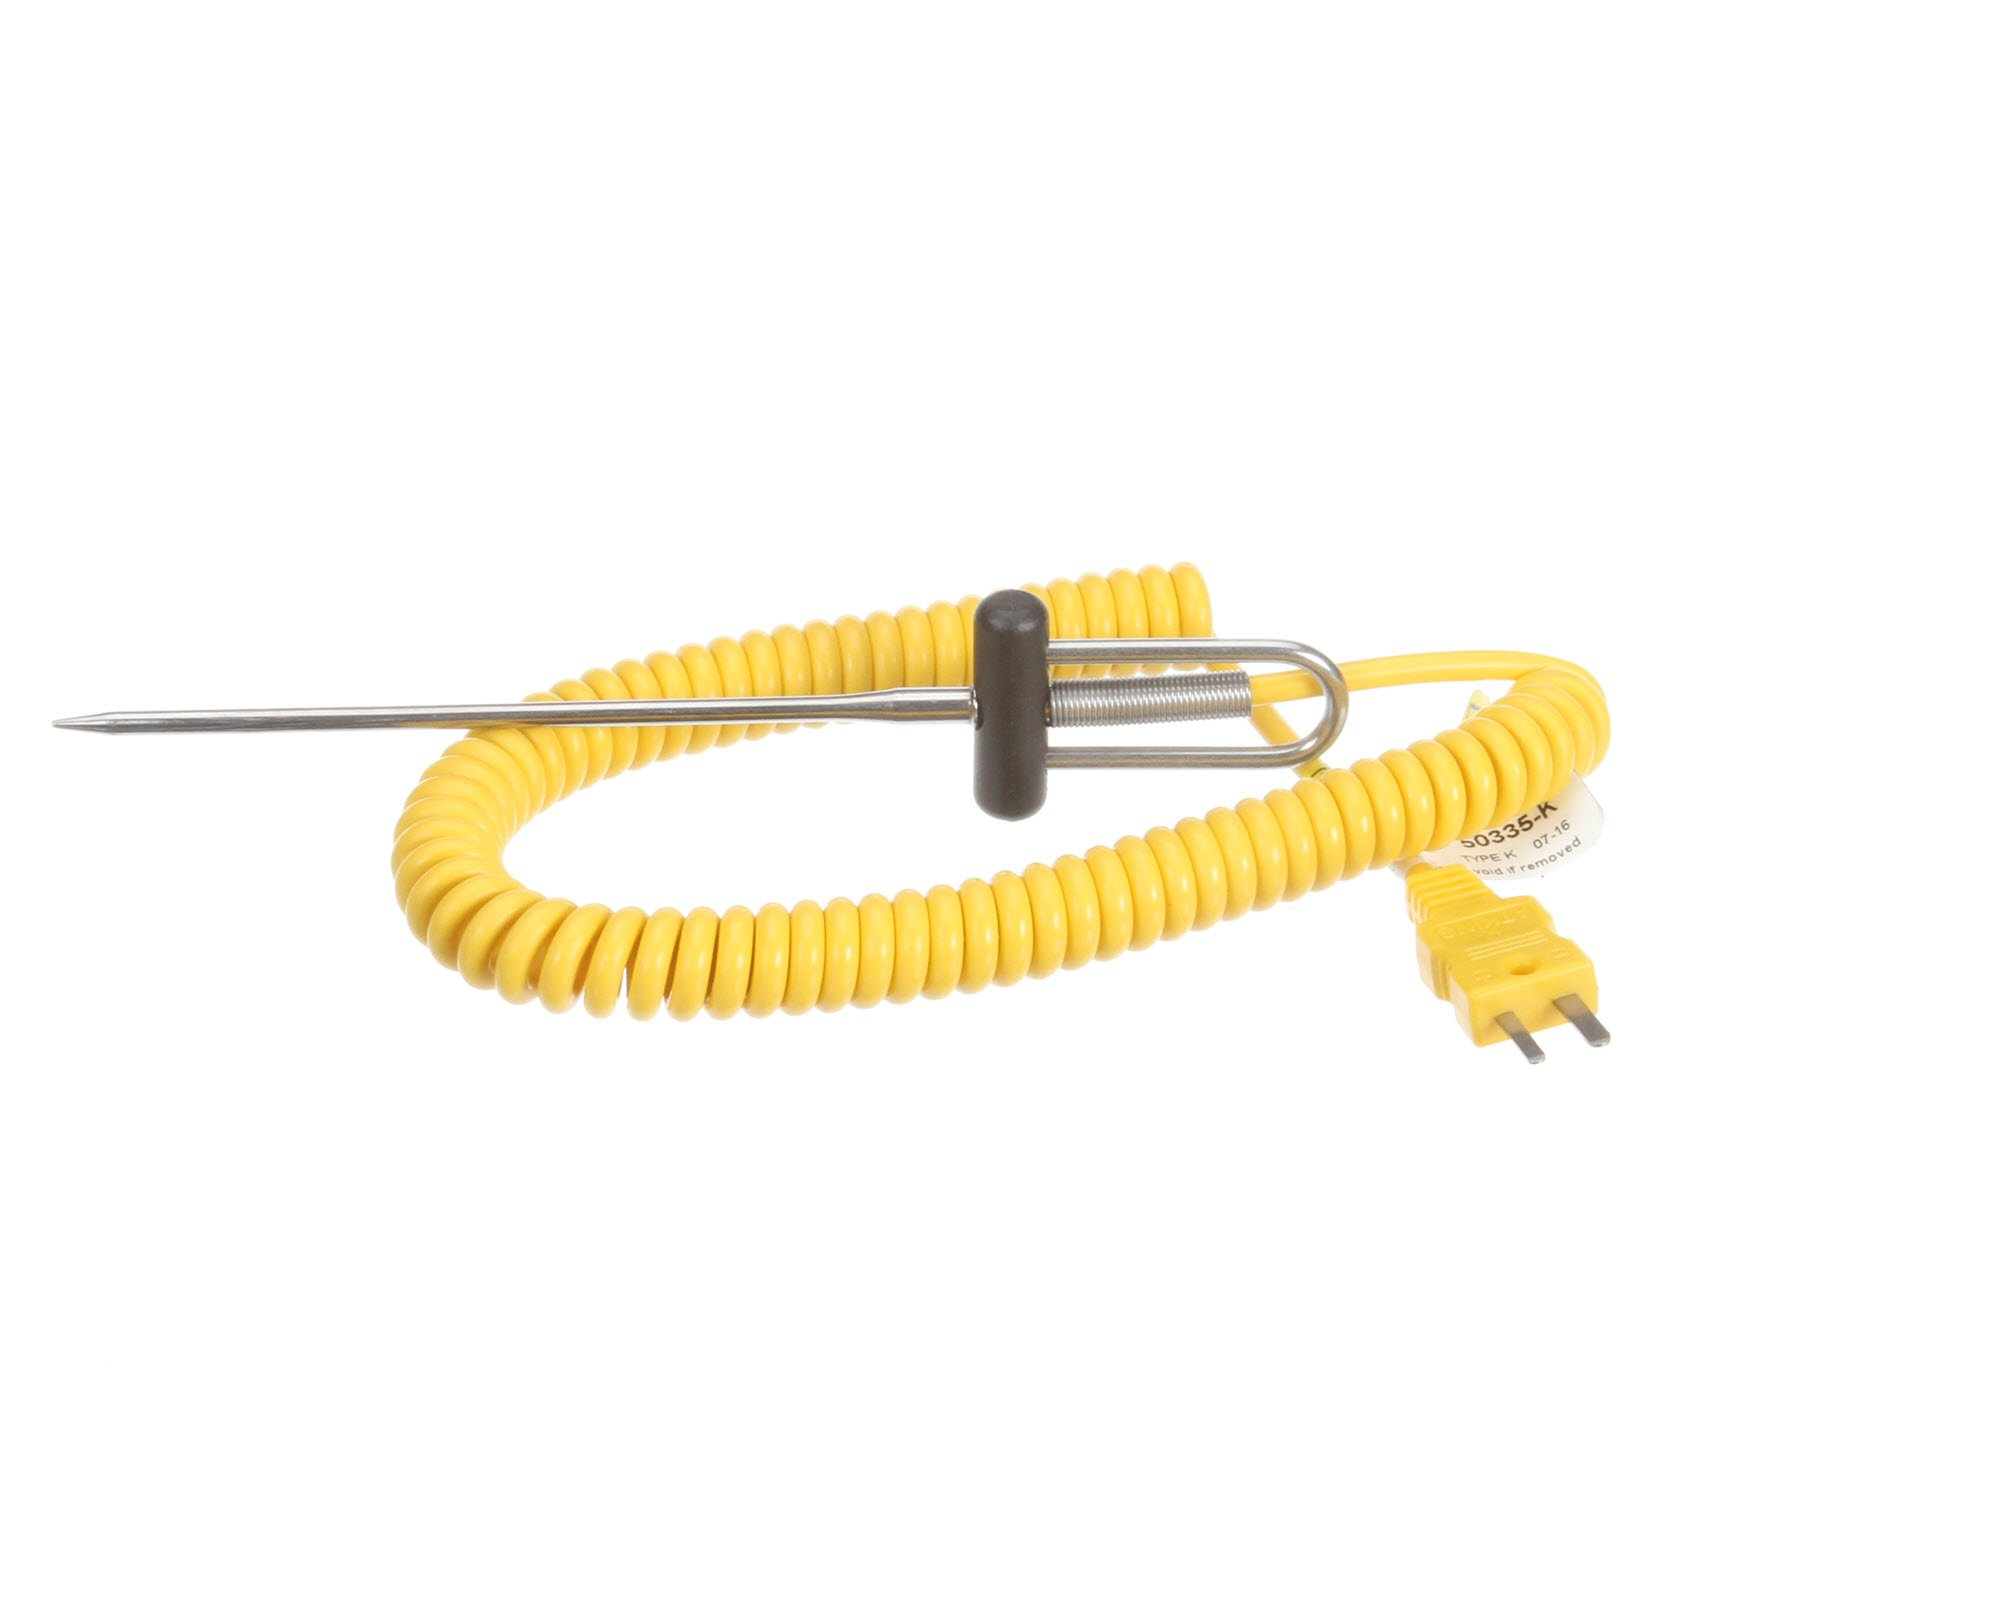 Cooper-Atkins 50335-K Type K 1/8'' Dia. Needle Probe Thermocouple Probe, -40 to +500 degrees F Temperature Range